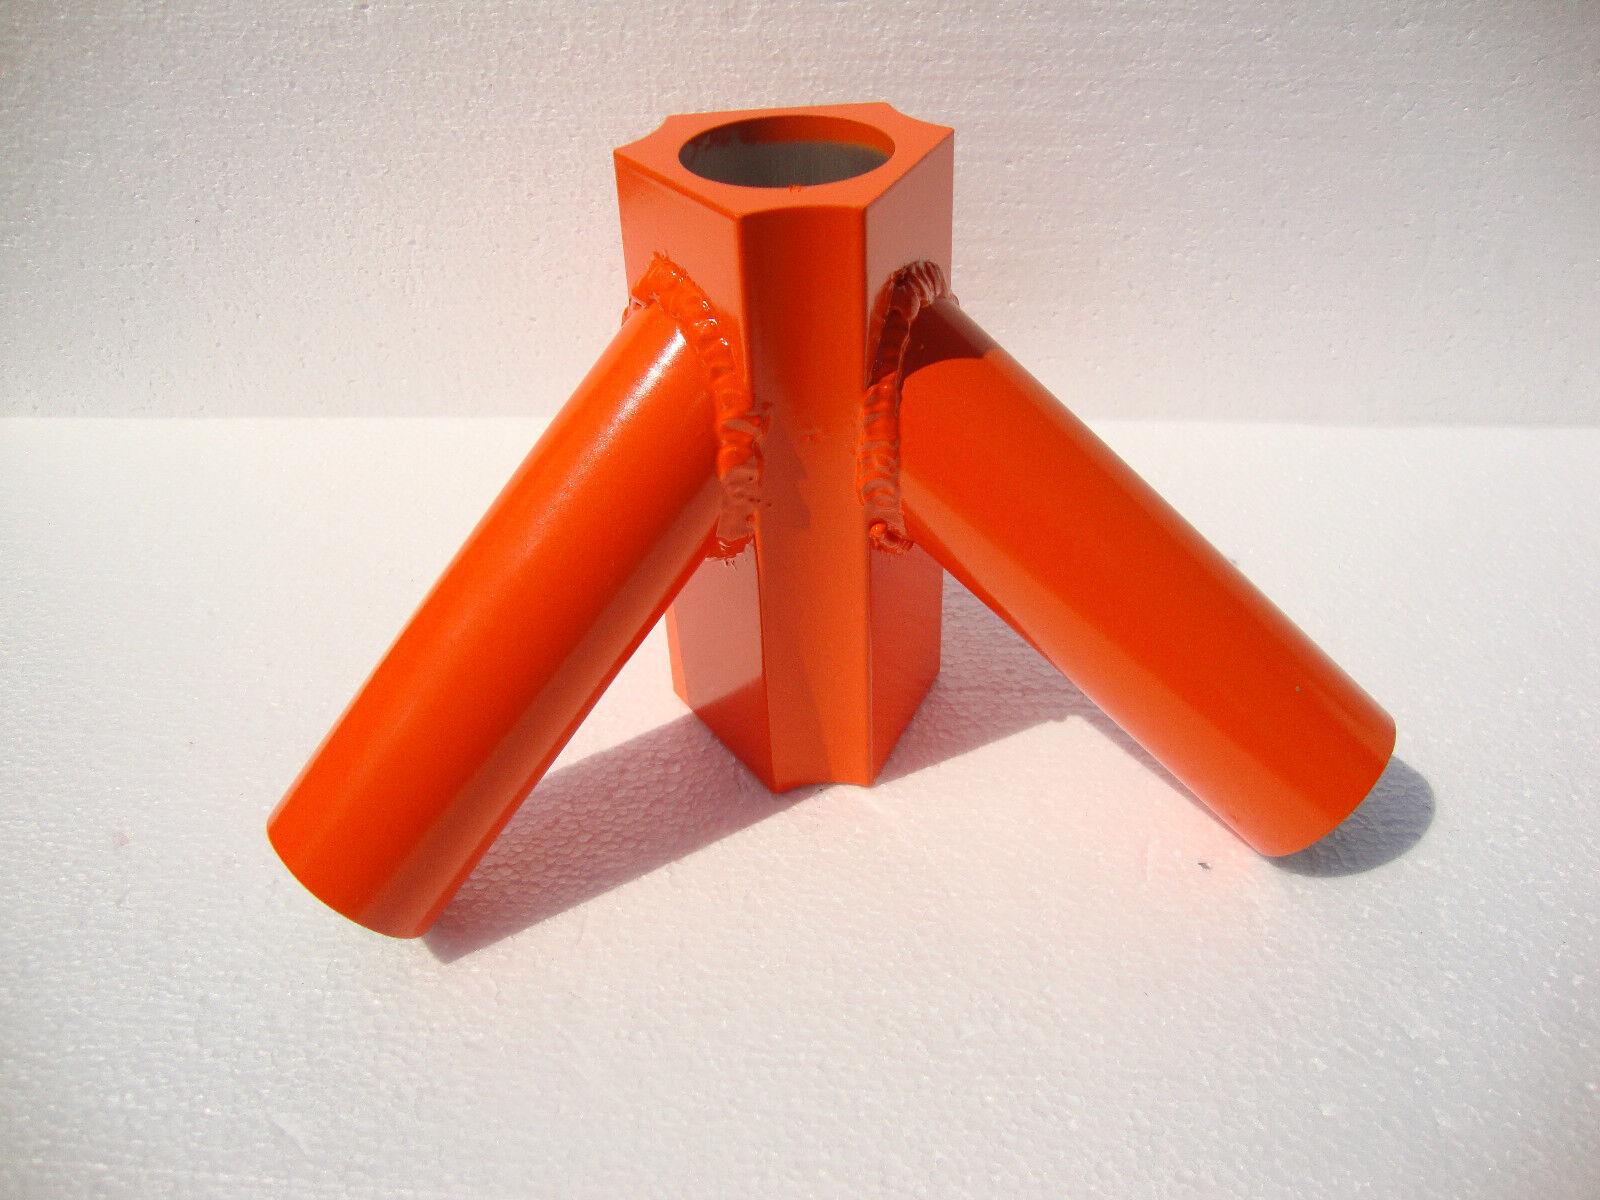 Antenna Radio Tower Aluminum Orange Tripod For Use With Military 48 Mast Pole